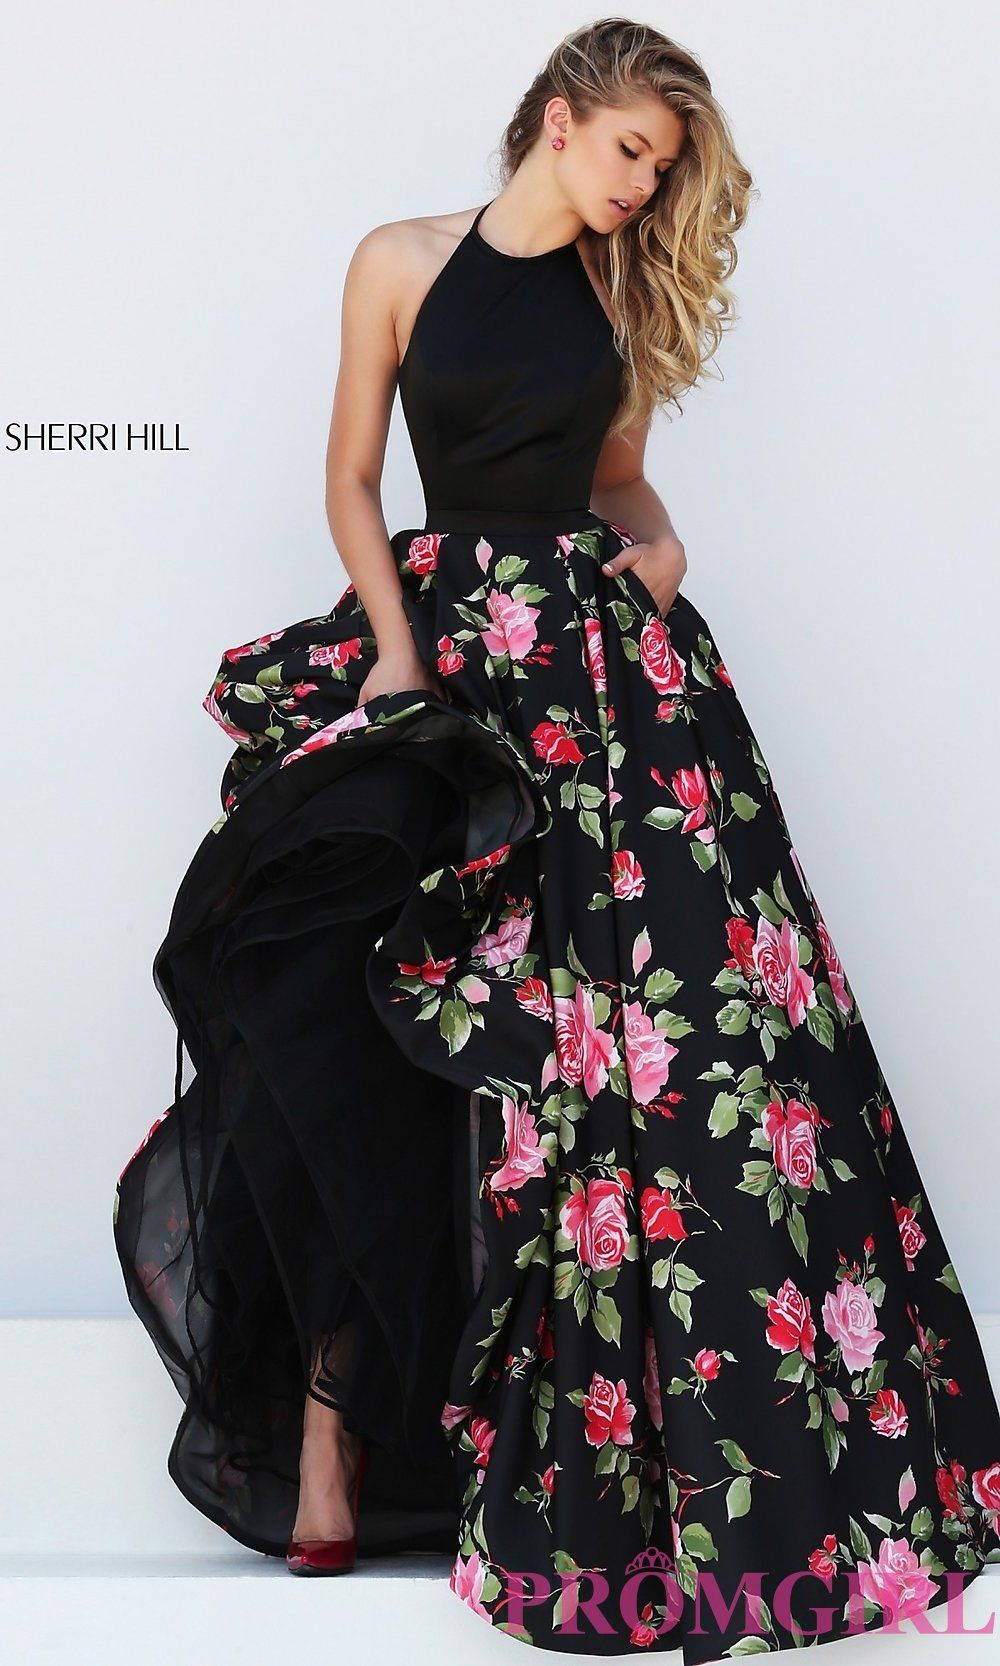 Image of floor length halter top floral print dress detail image